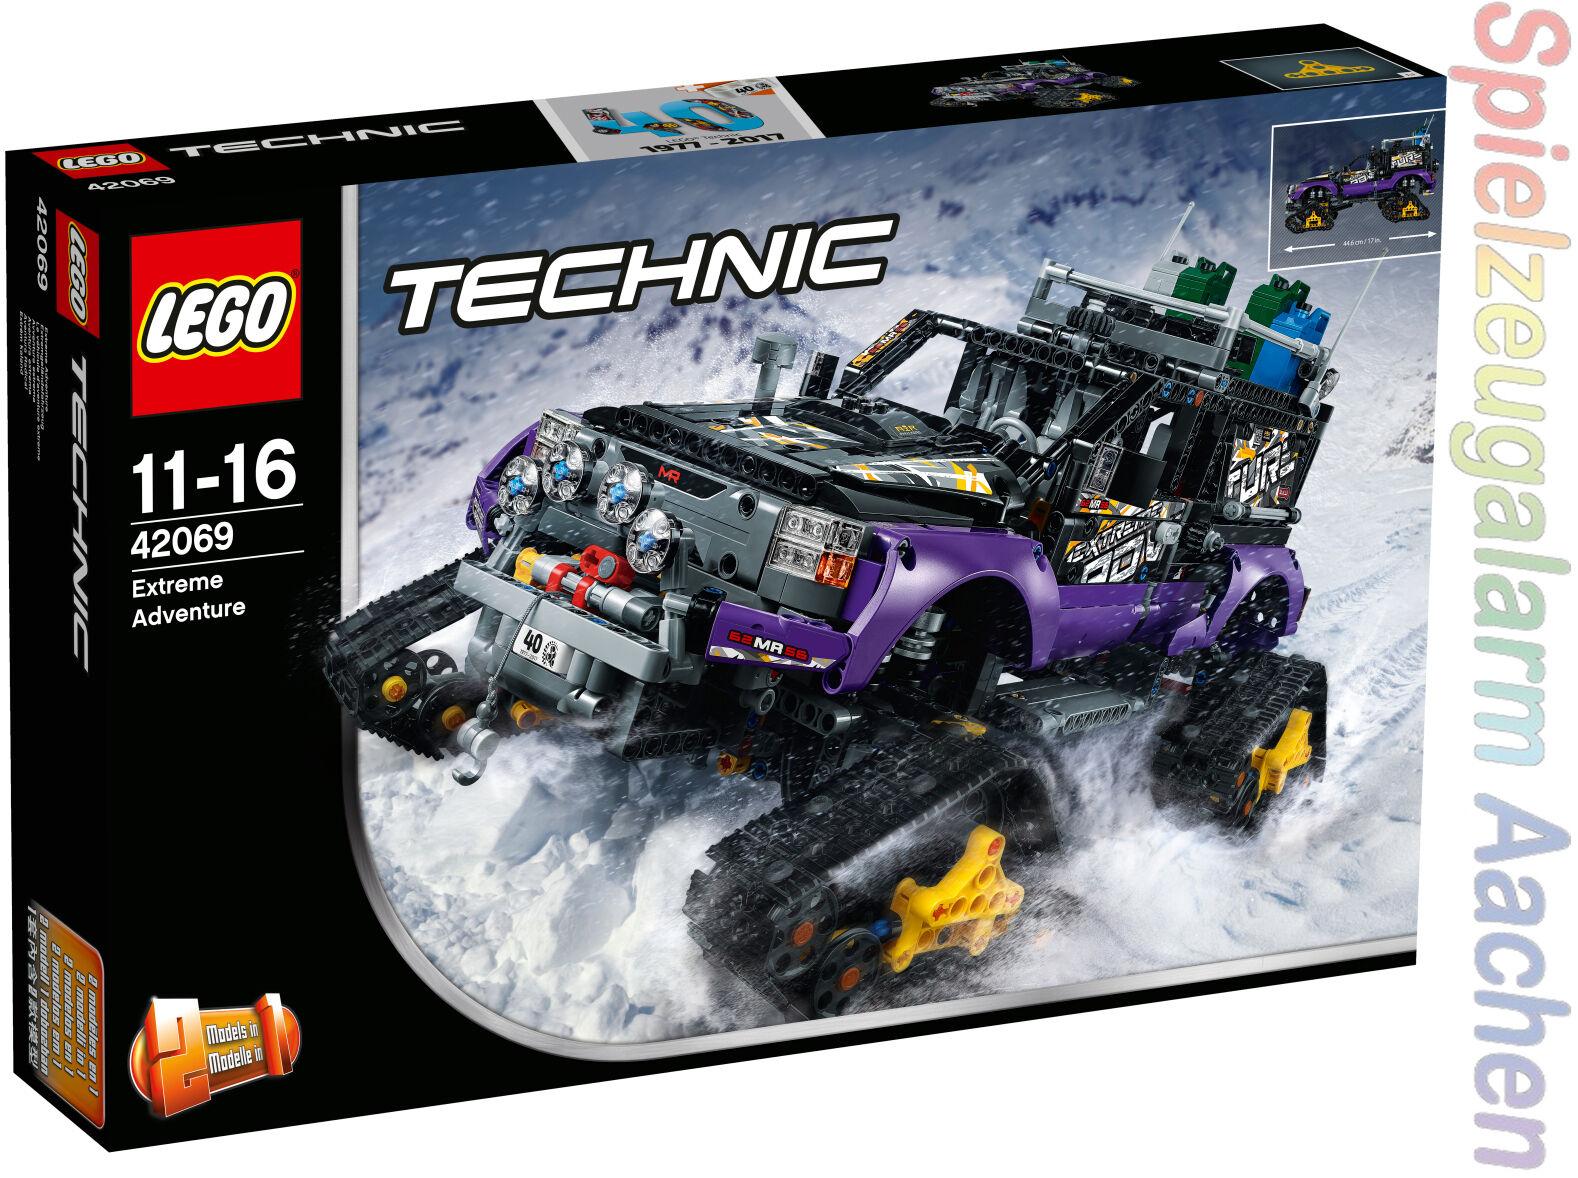 LEGO TECHNIK 42069 Extremgeländefahrzeug véhicule d'aventure extrême N8 17